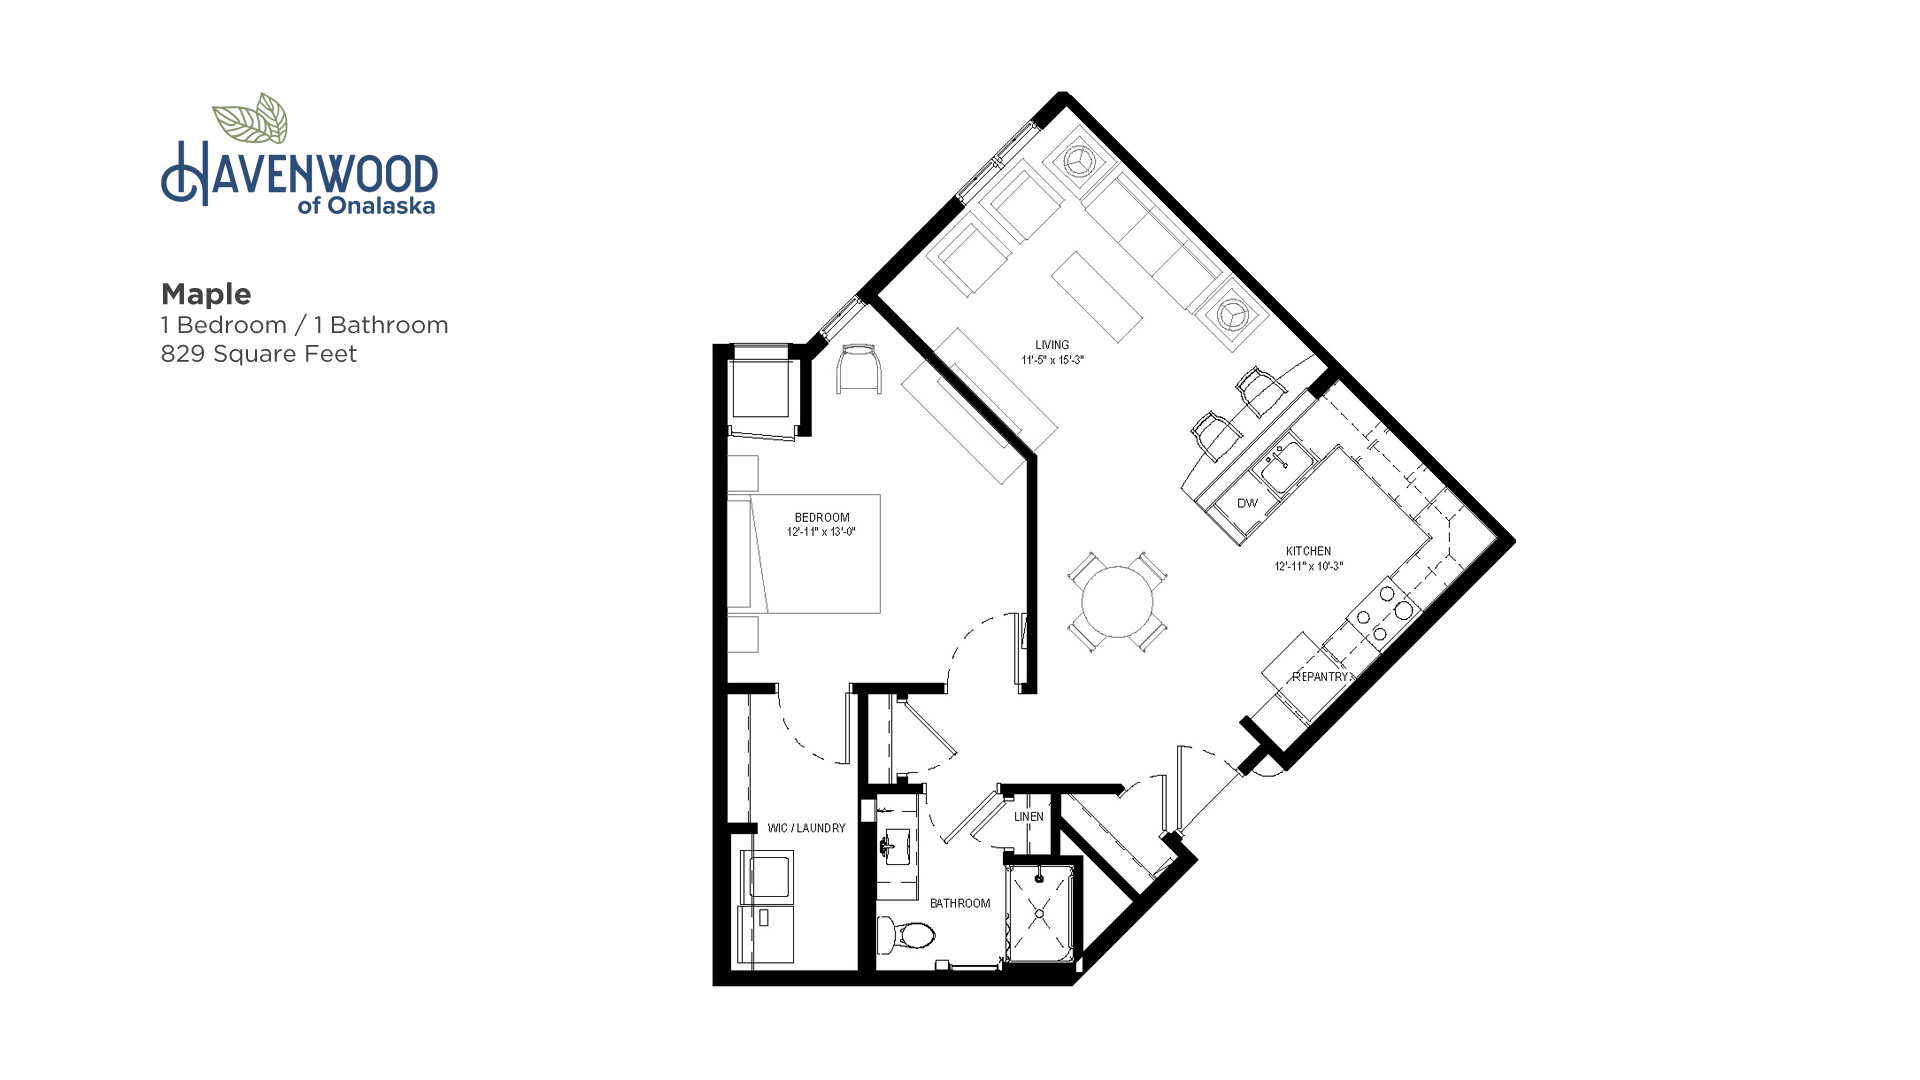 Havenwood of Onalaska Maple Floor Plan